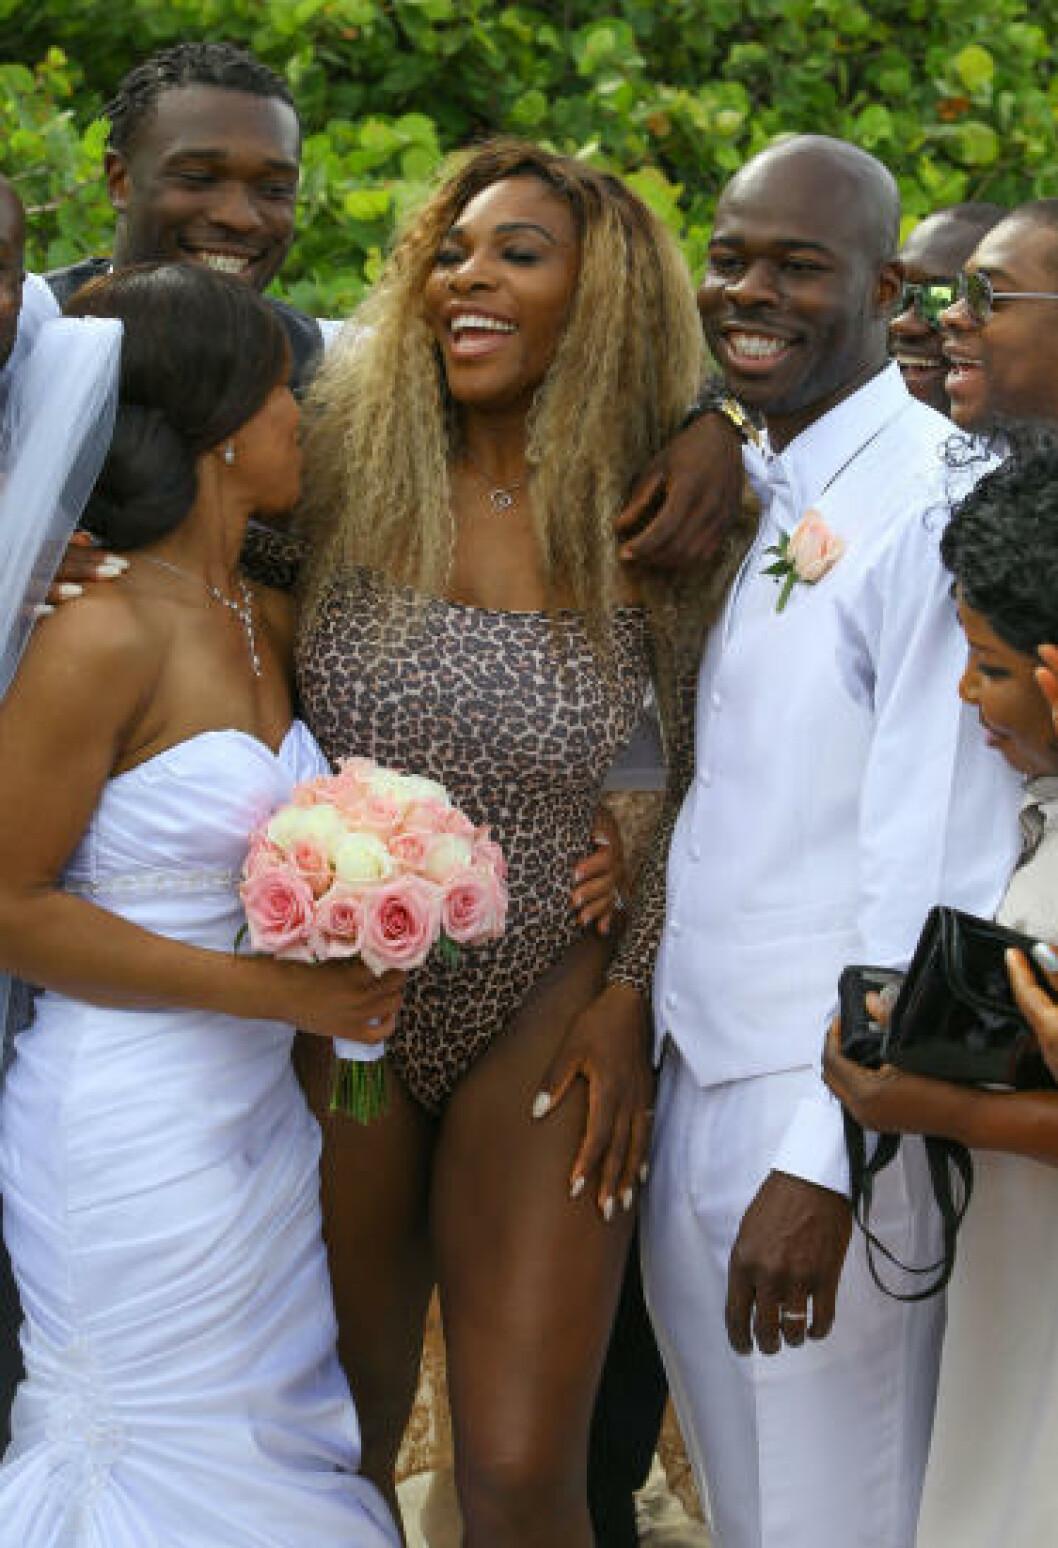 <strong>BRYLLUP:</strong> Serena Williams trøster seg etter fiasko i French Open. Her er hun i bryllup - i bare badedrakt. Foto: Stella Pictures